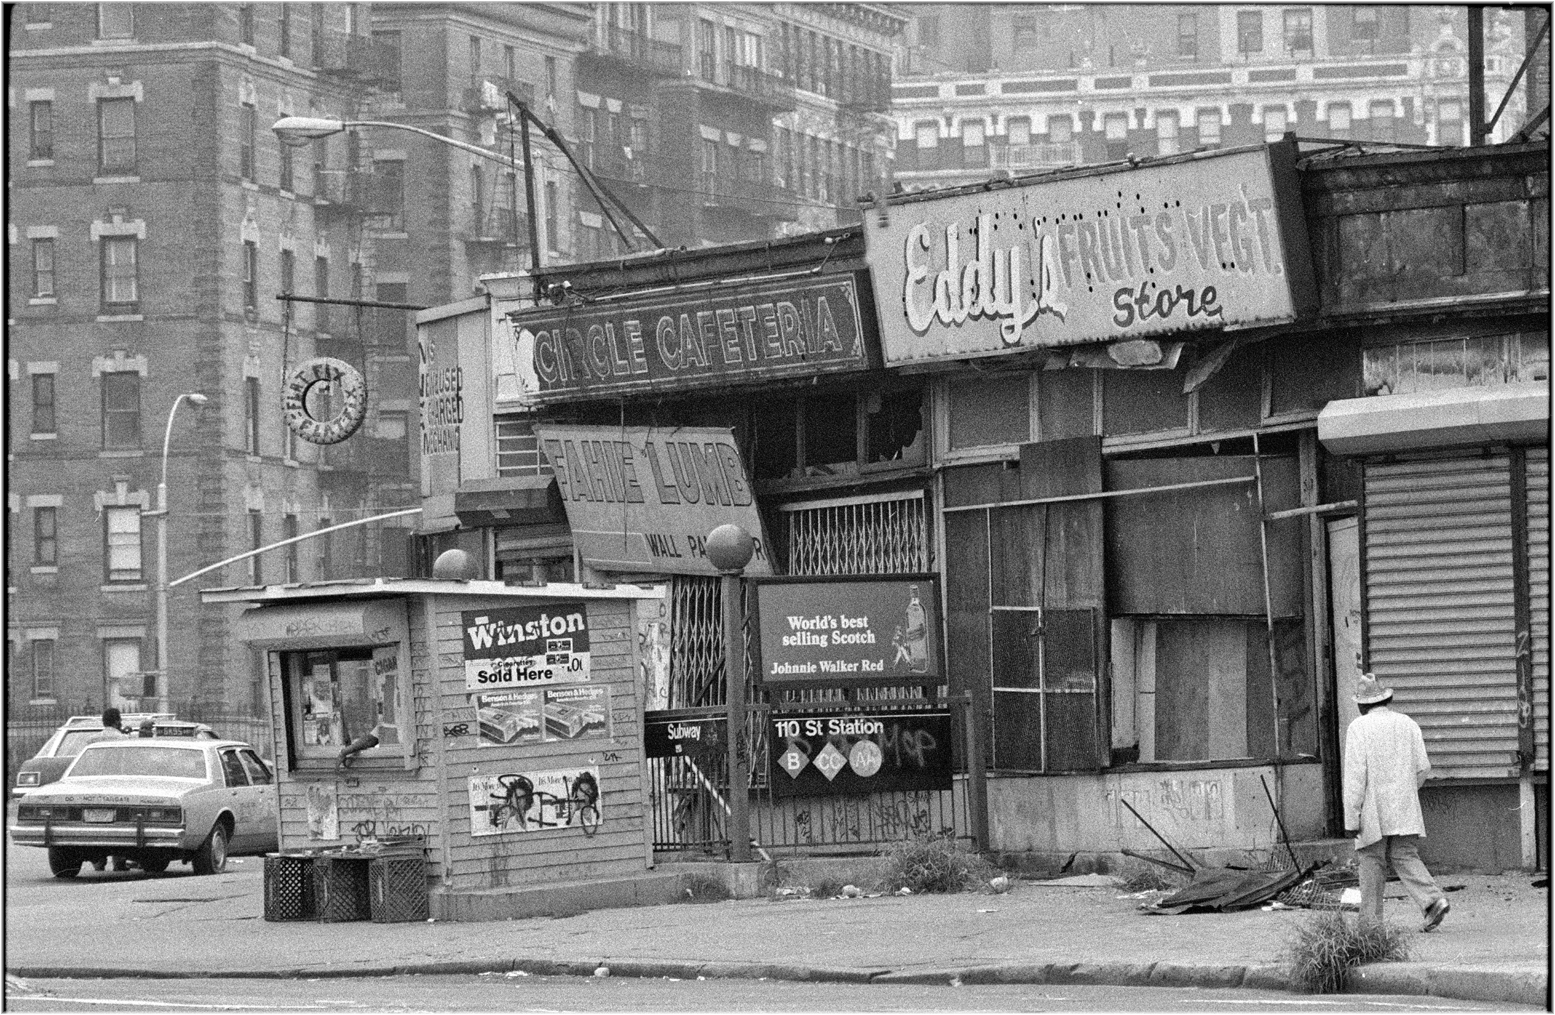 Frederick Douglass Circle Harlem 1985 Black And White